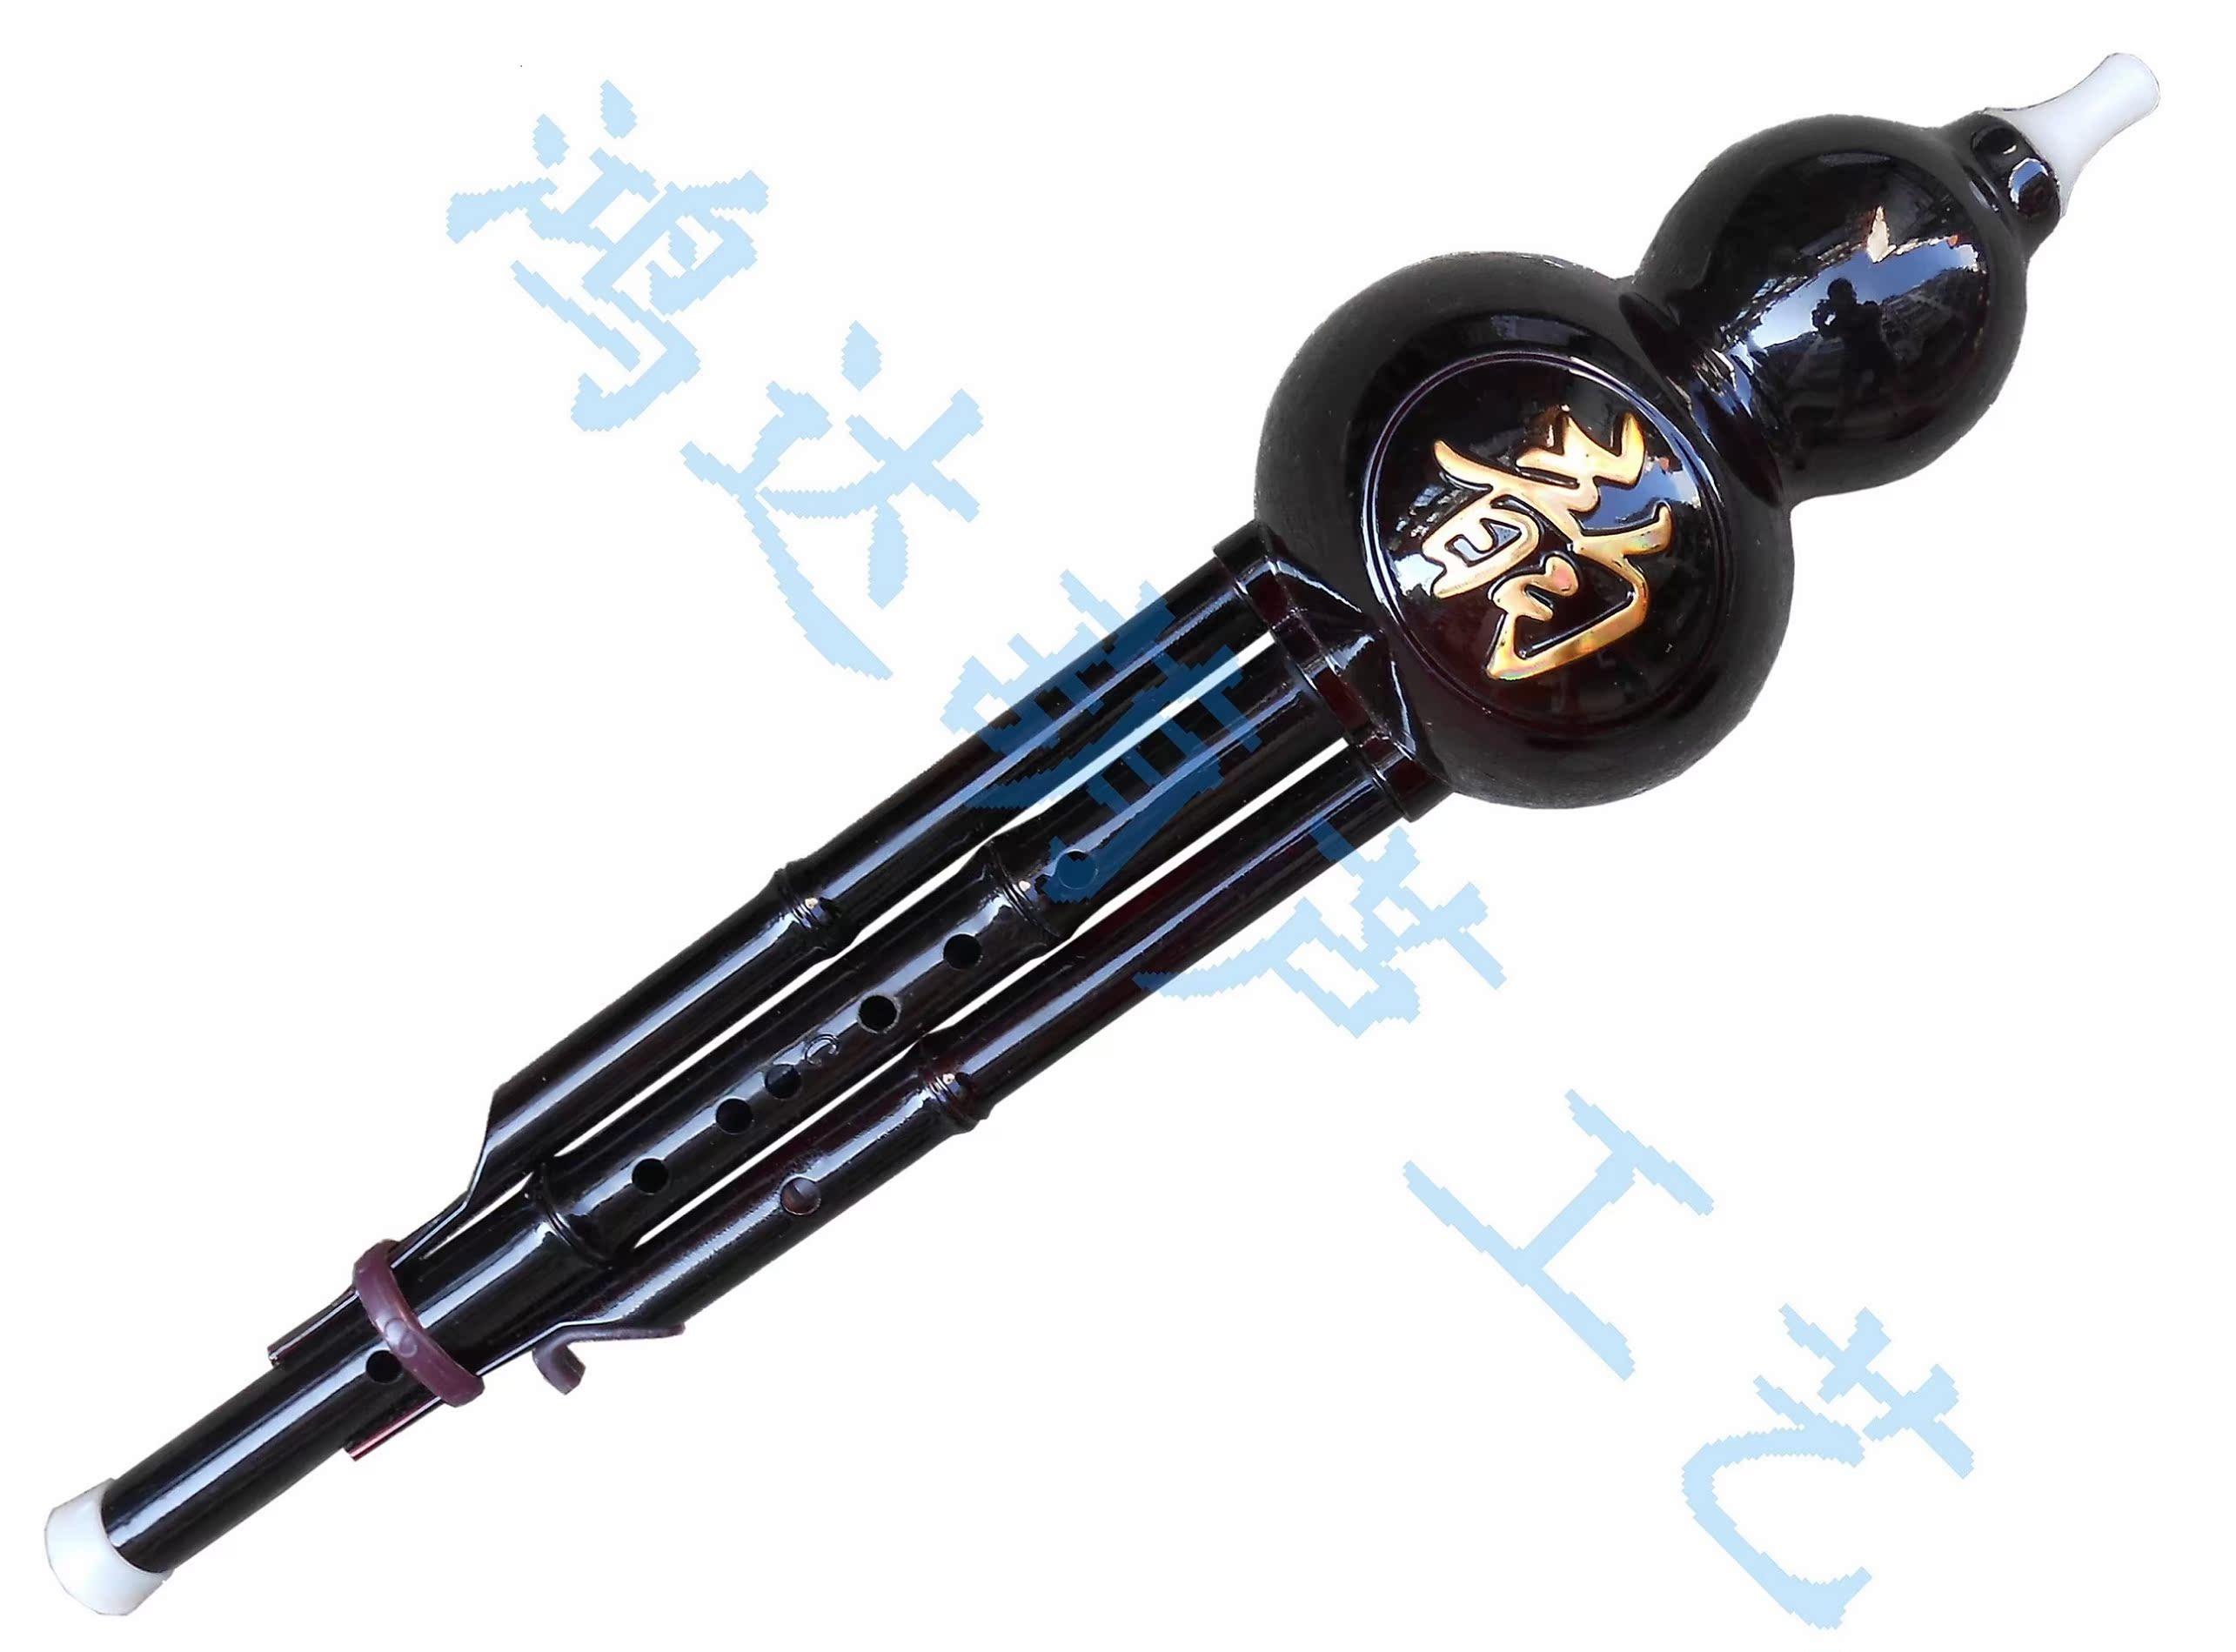 Флейта 厂家直销初学胶木仿红木葫芦丝可拆c调降b调葫芦丝乐器葫芦丝包邮